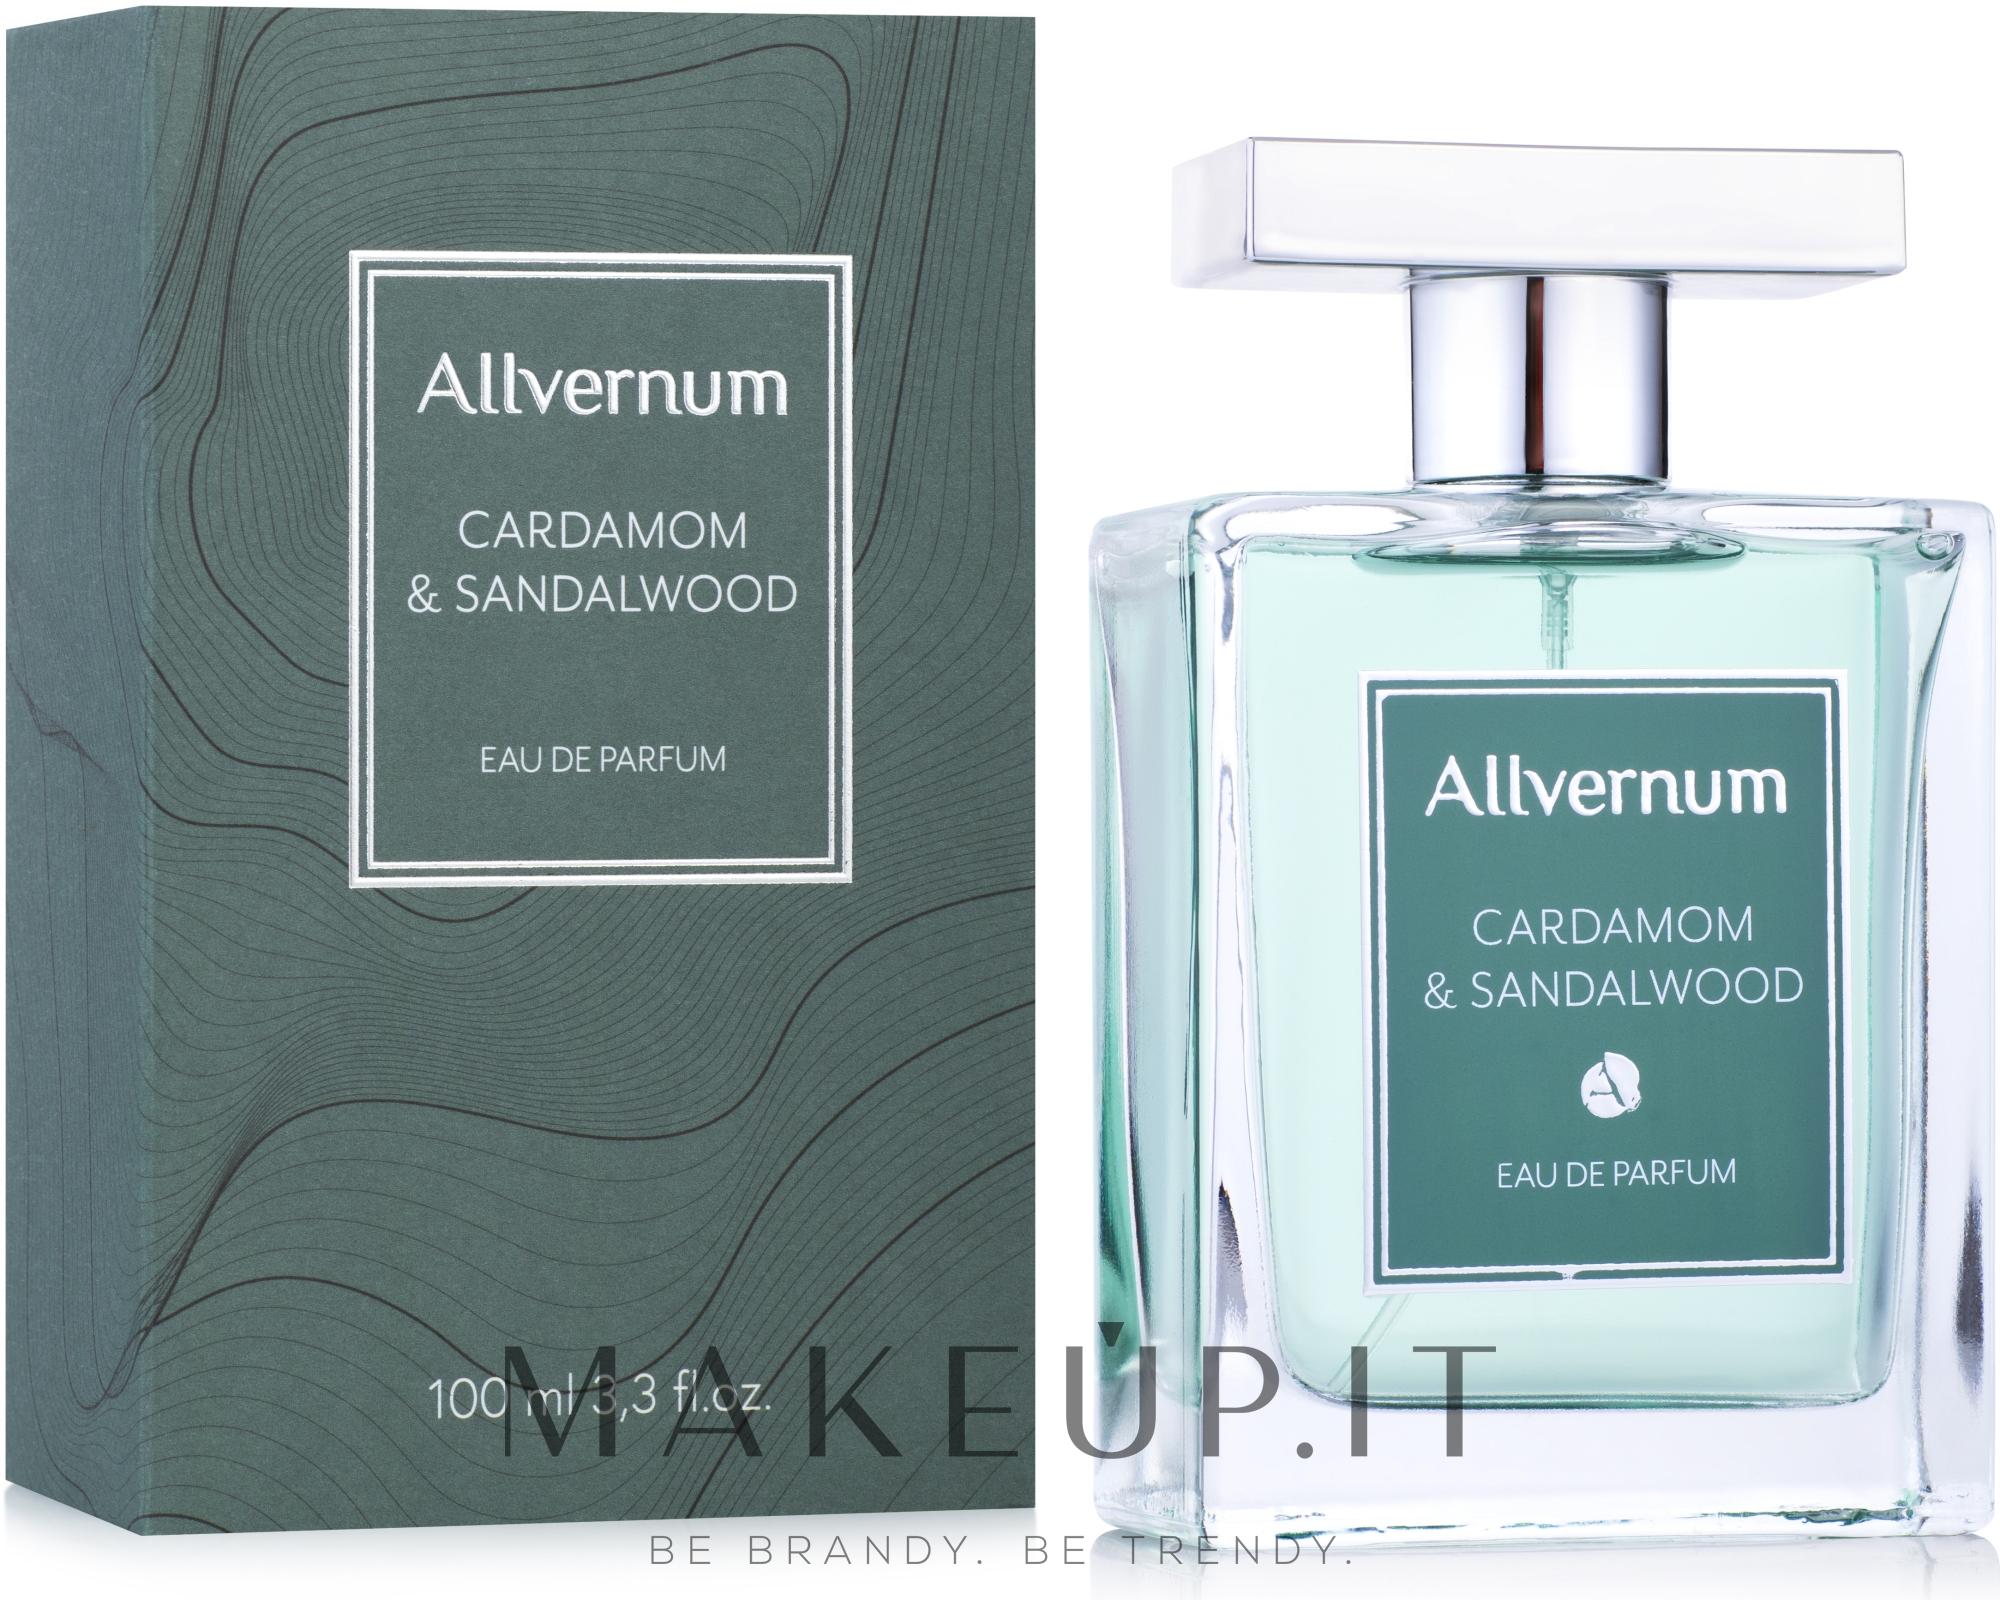 Allvernum Cardamom & Sandalwood - Eau de Parfum — foto 100 ml